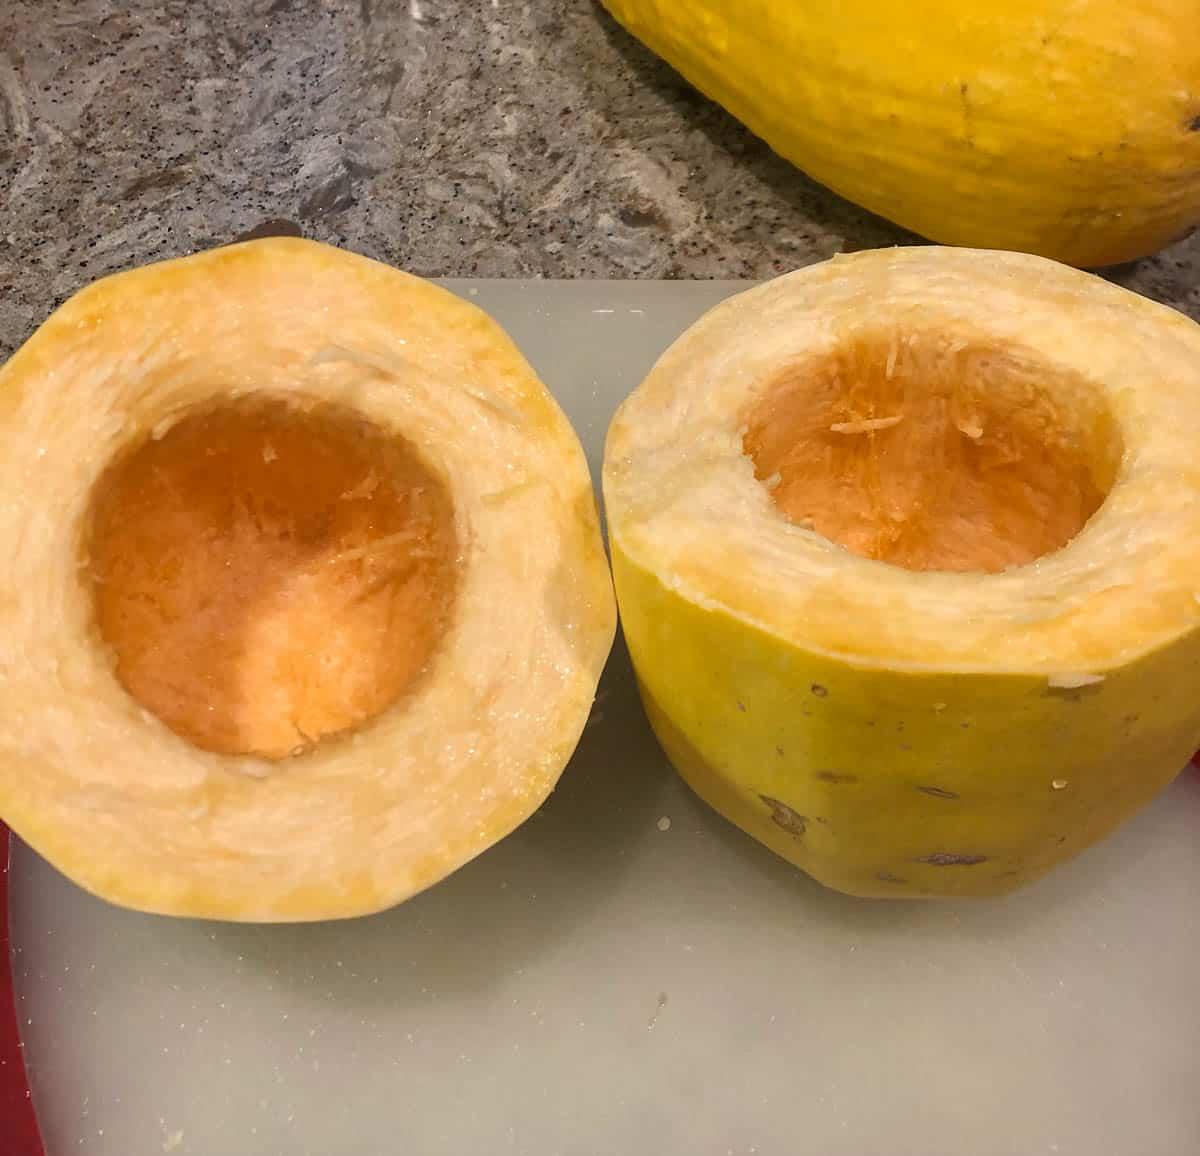 squash cut in half